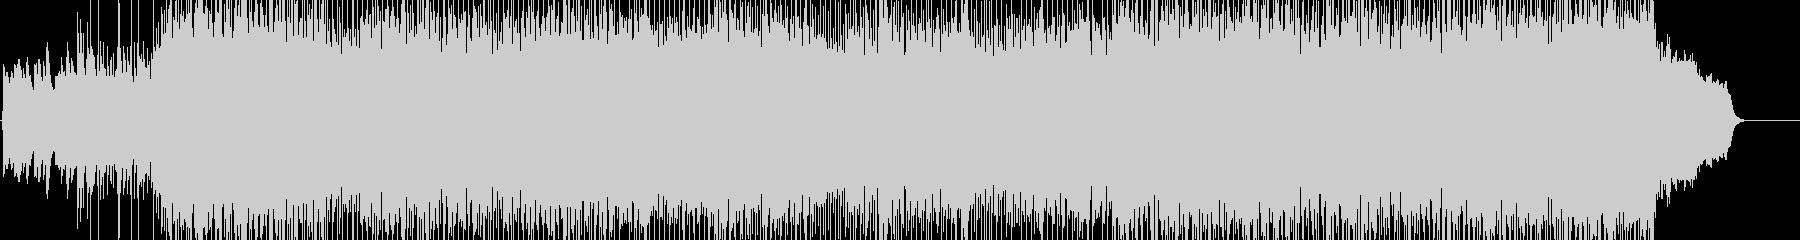 HARD/HEAVY・激しい BGM31の未再生の波形